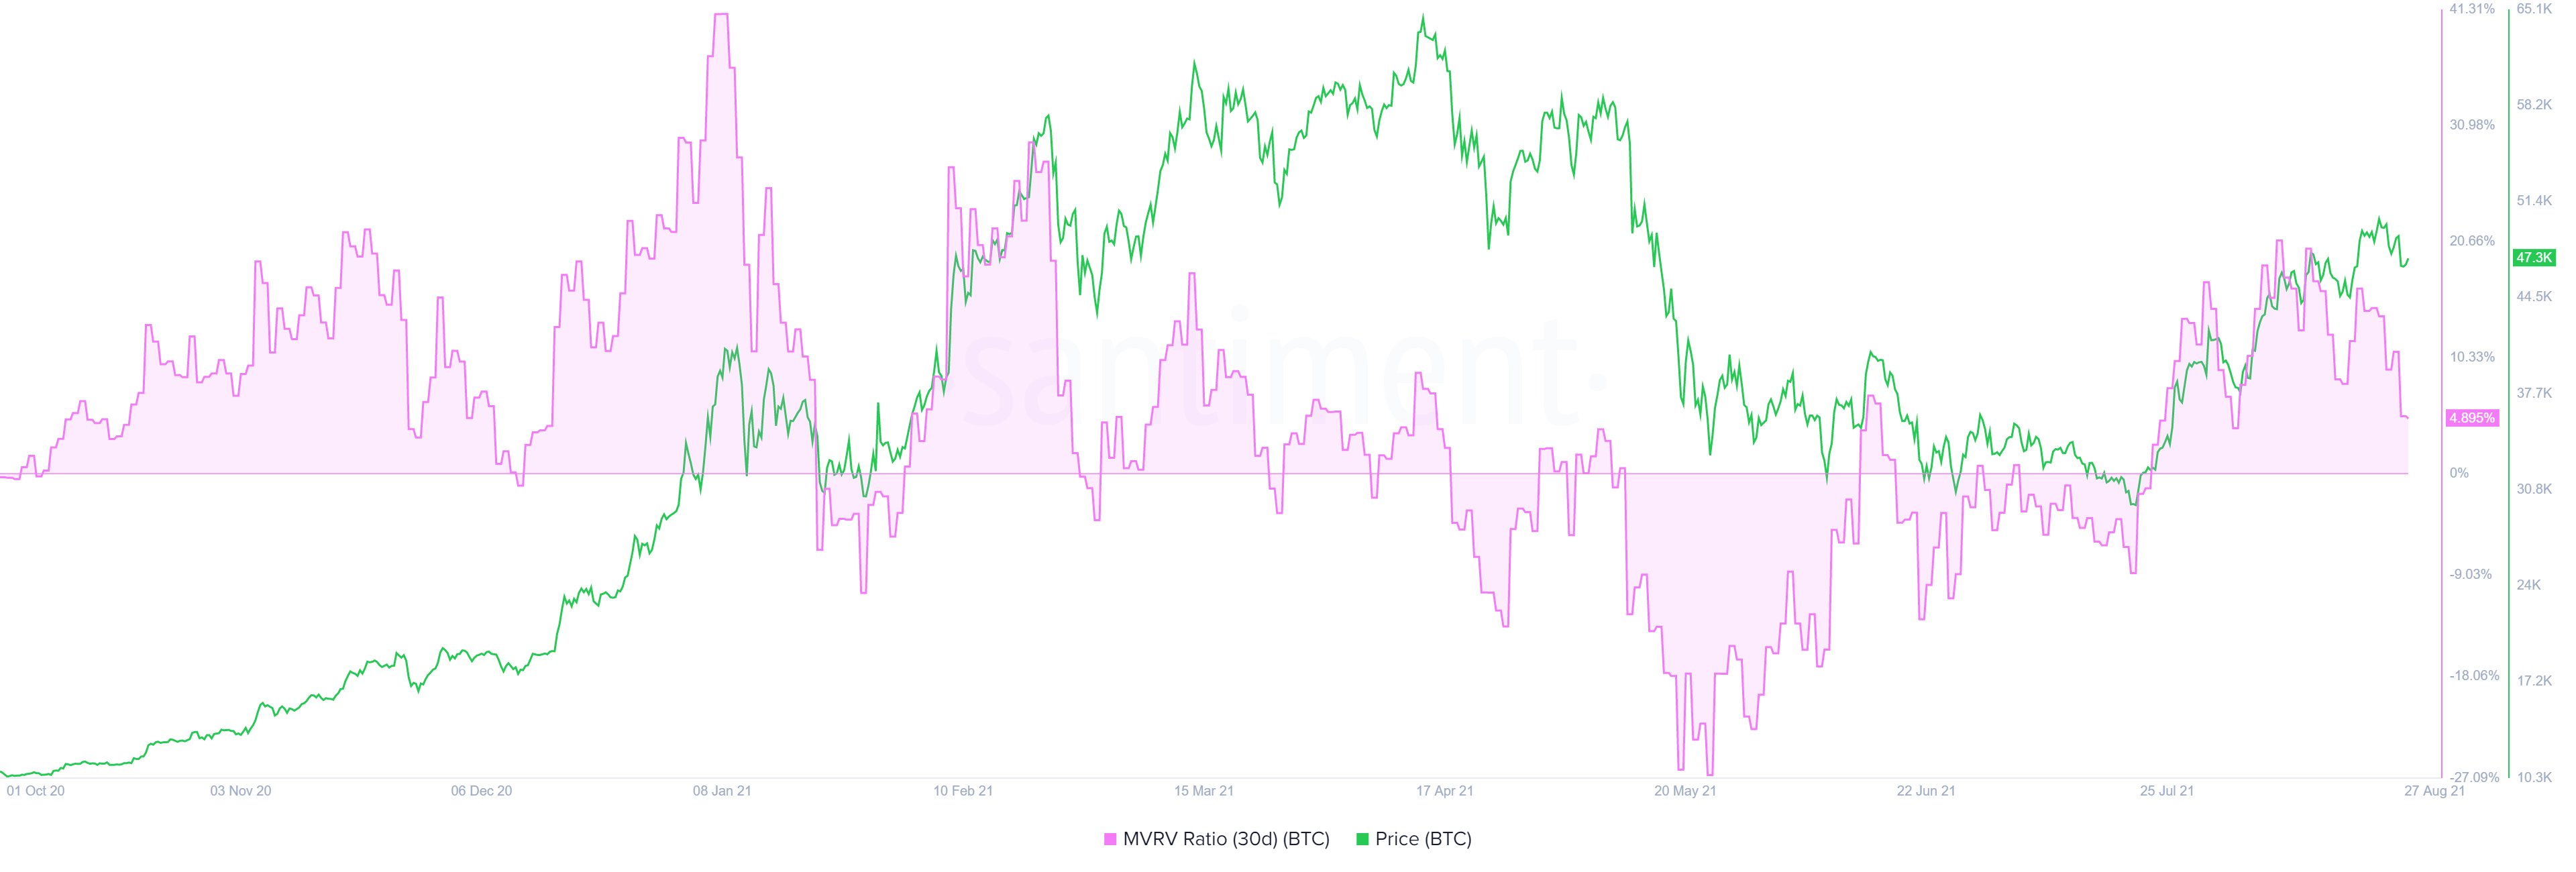 BTC 30-day MVRV chart